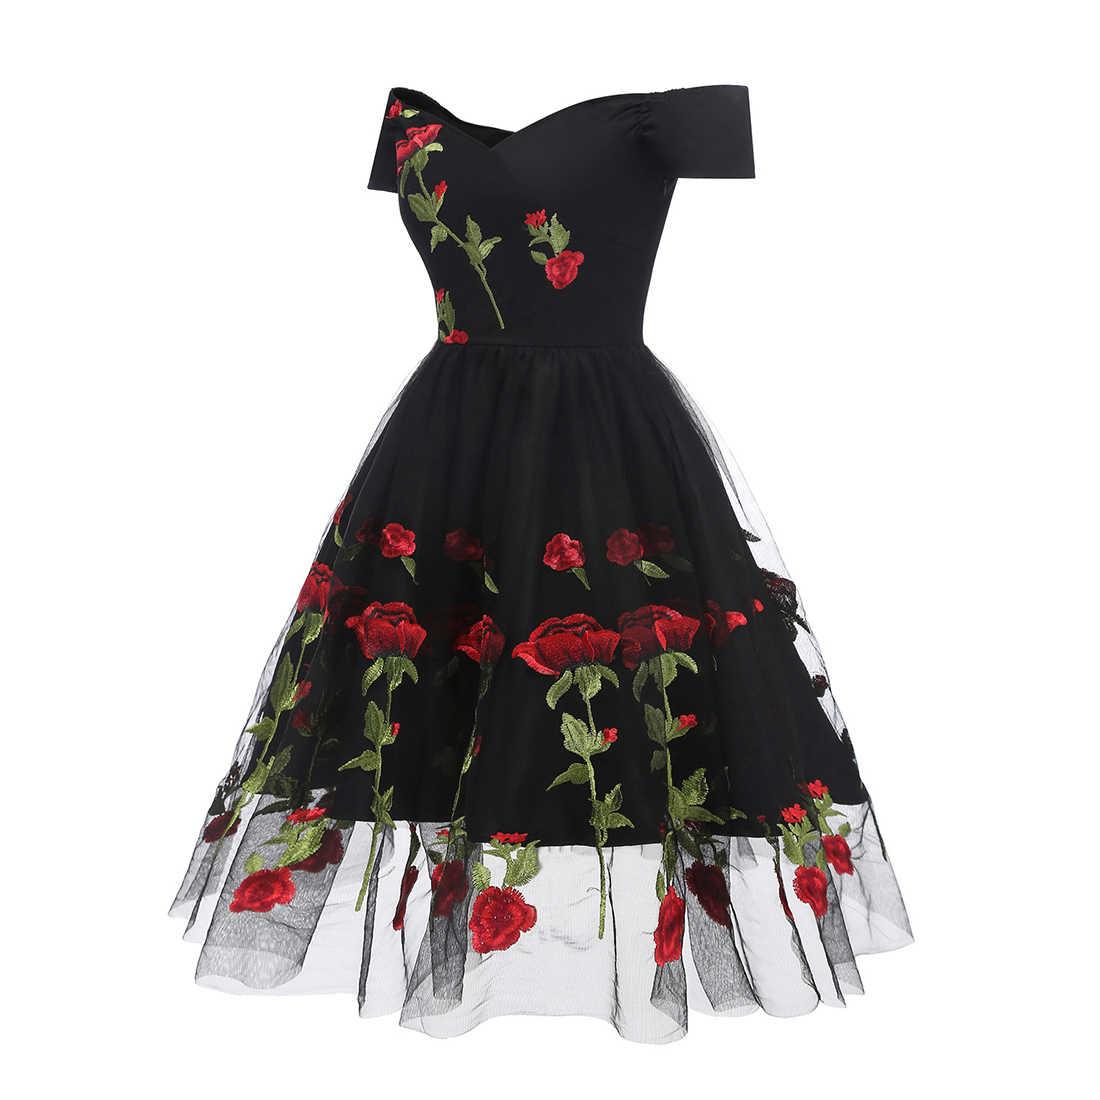 2019 Summer Dress Women Vintage 70s Mexican Ethnic Floral Embroidered Boho Mini Off Shoulder Party Dress Vestido Robe Femme Gift Dresses Aliexpress